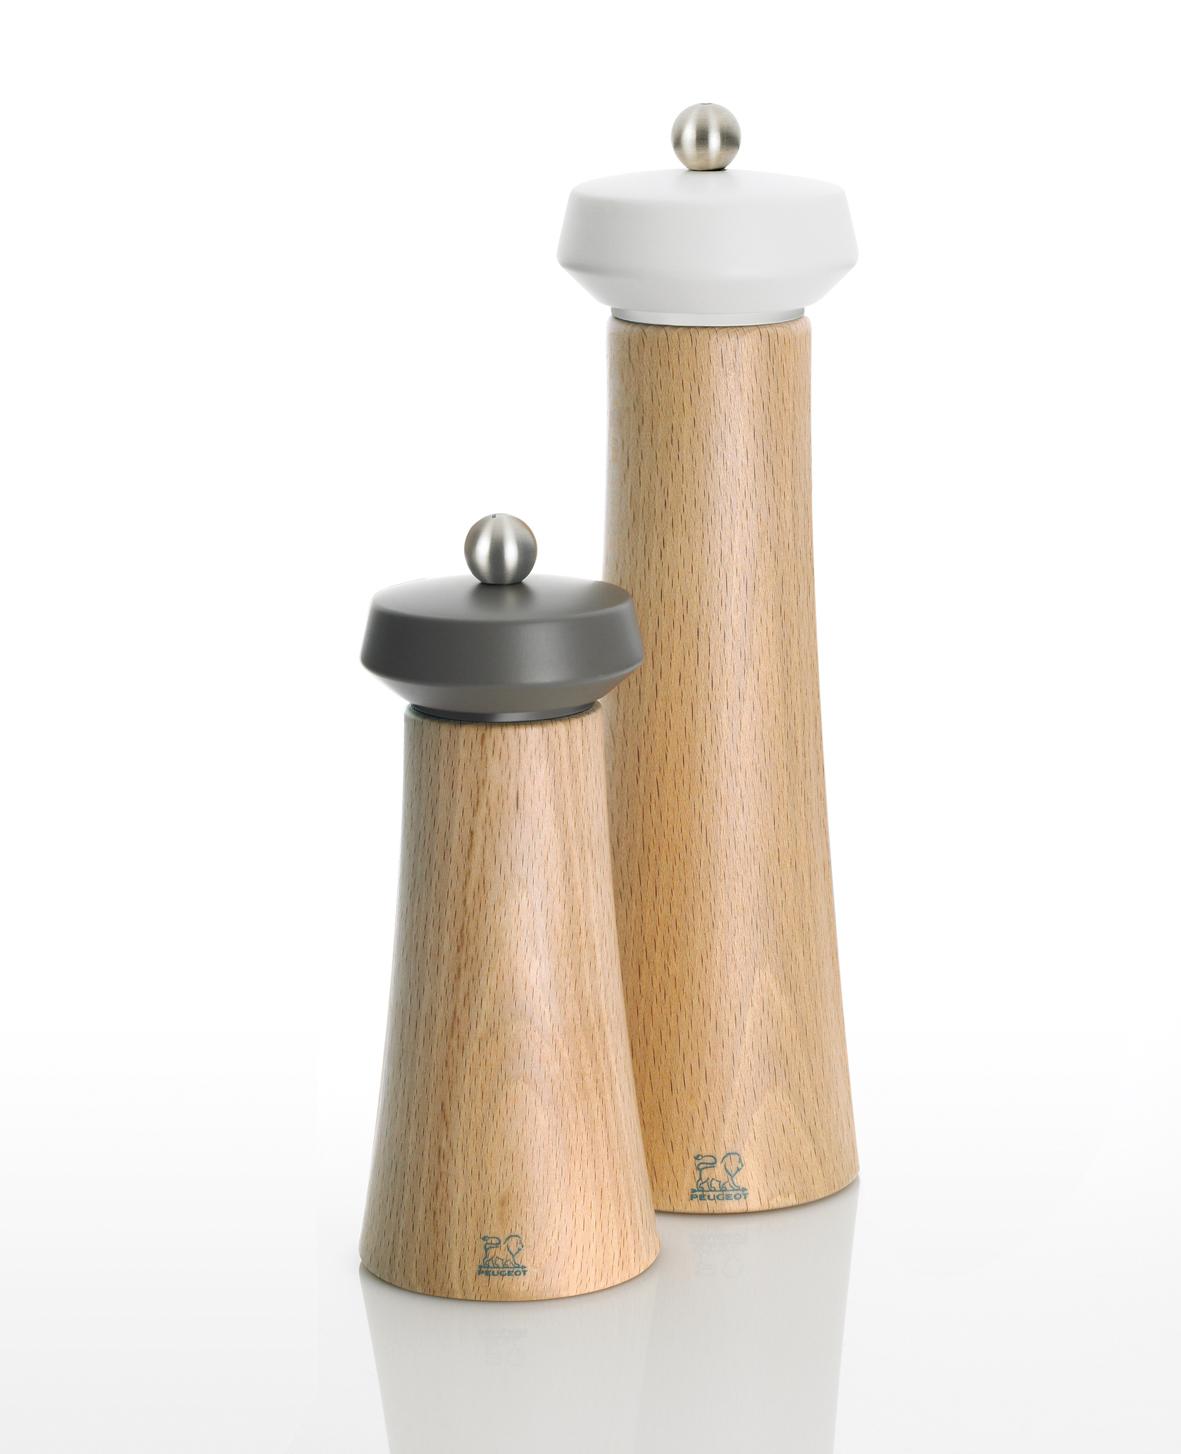 Wood Salt And Pepper Mills TOKYO For PEUGEOT 2013 On Behance